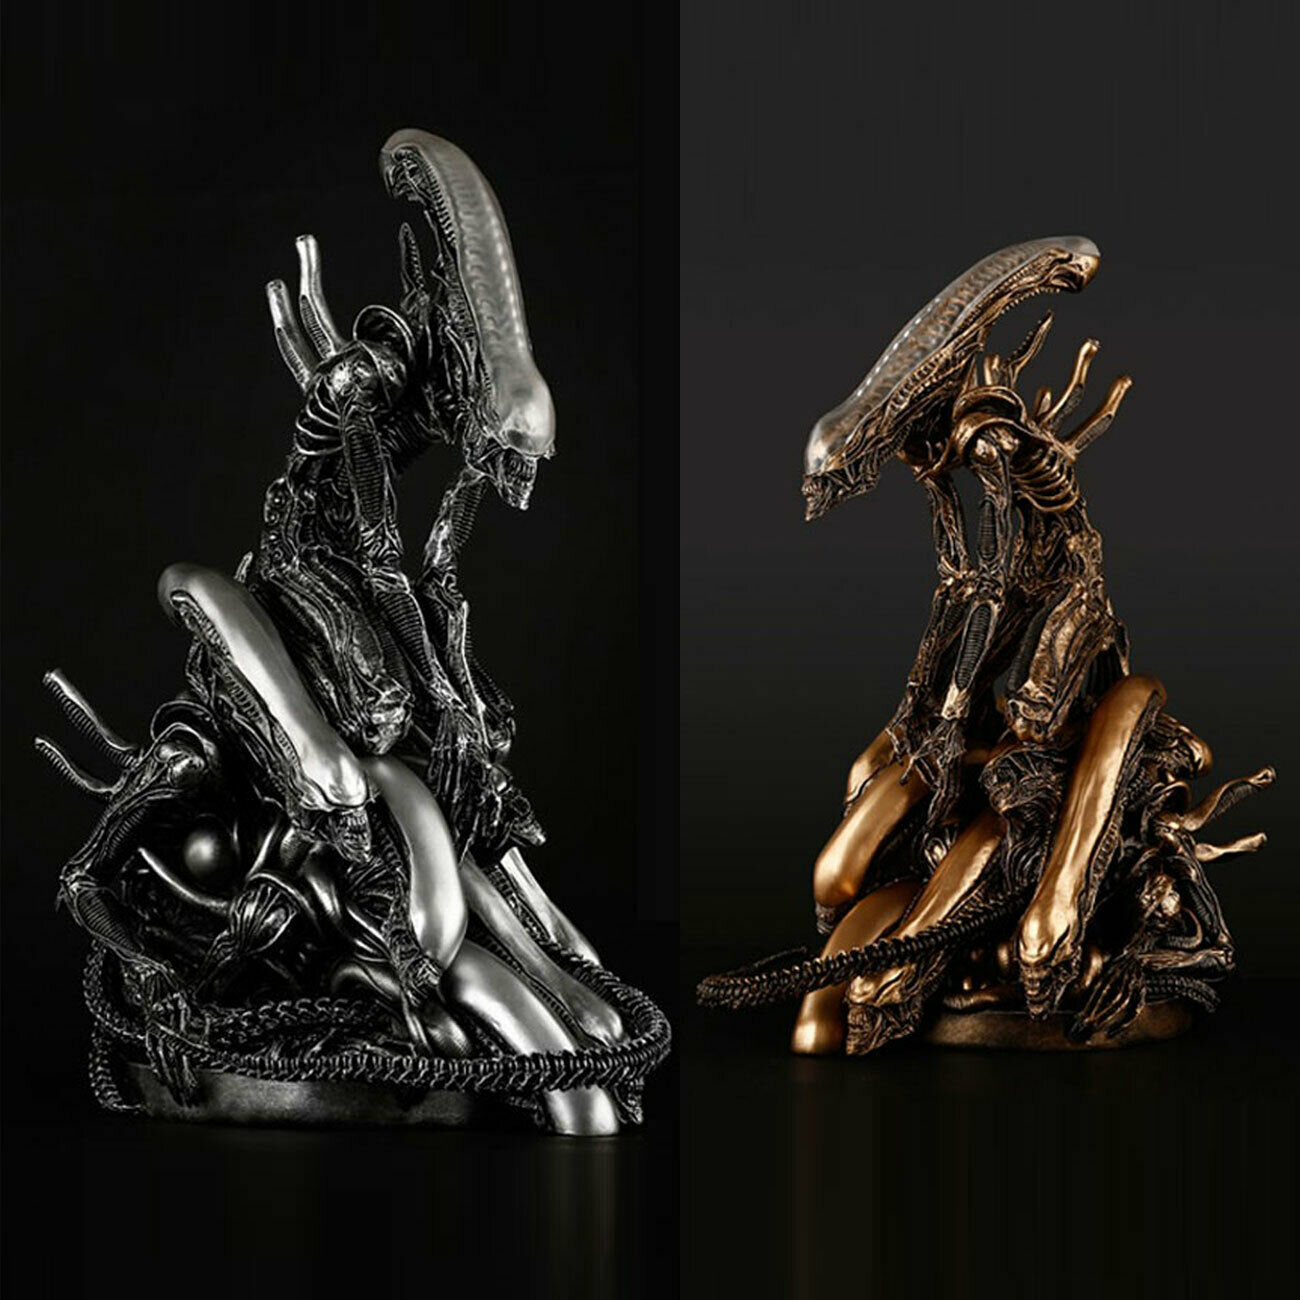 venta con alto descuento Takeya Takeya Takeya Takayuki Resina Estatua Escultura Alien 13.8  Figura Colección Modelo Nuevo  mejor opcion